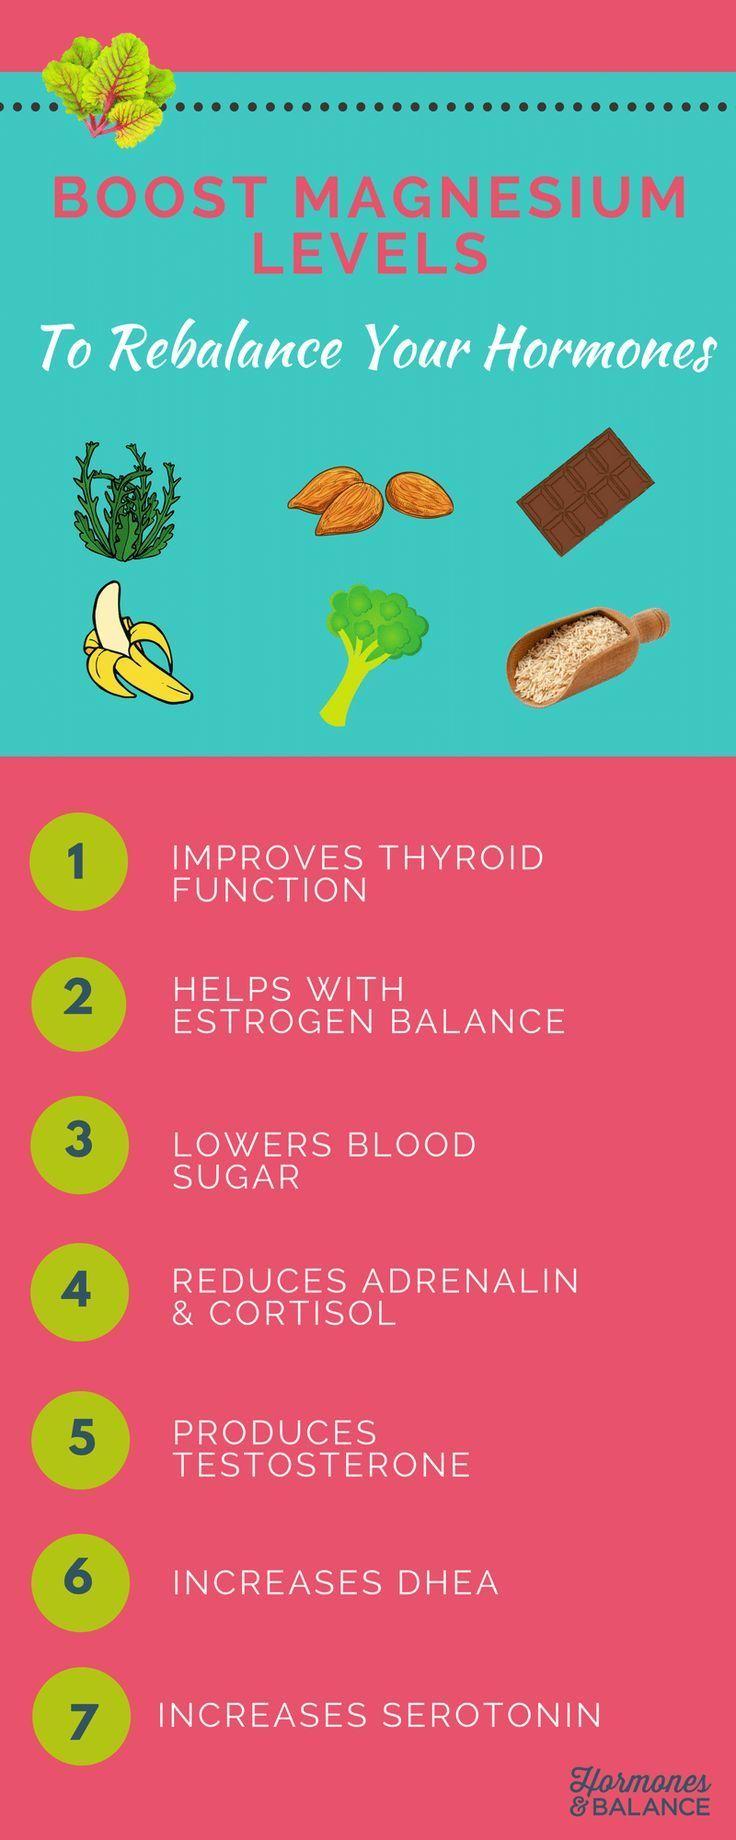 Boost Magnesium Levels to Rebalance Your Hormones